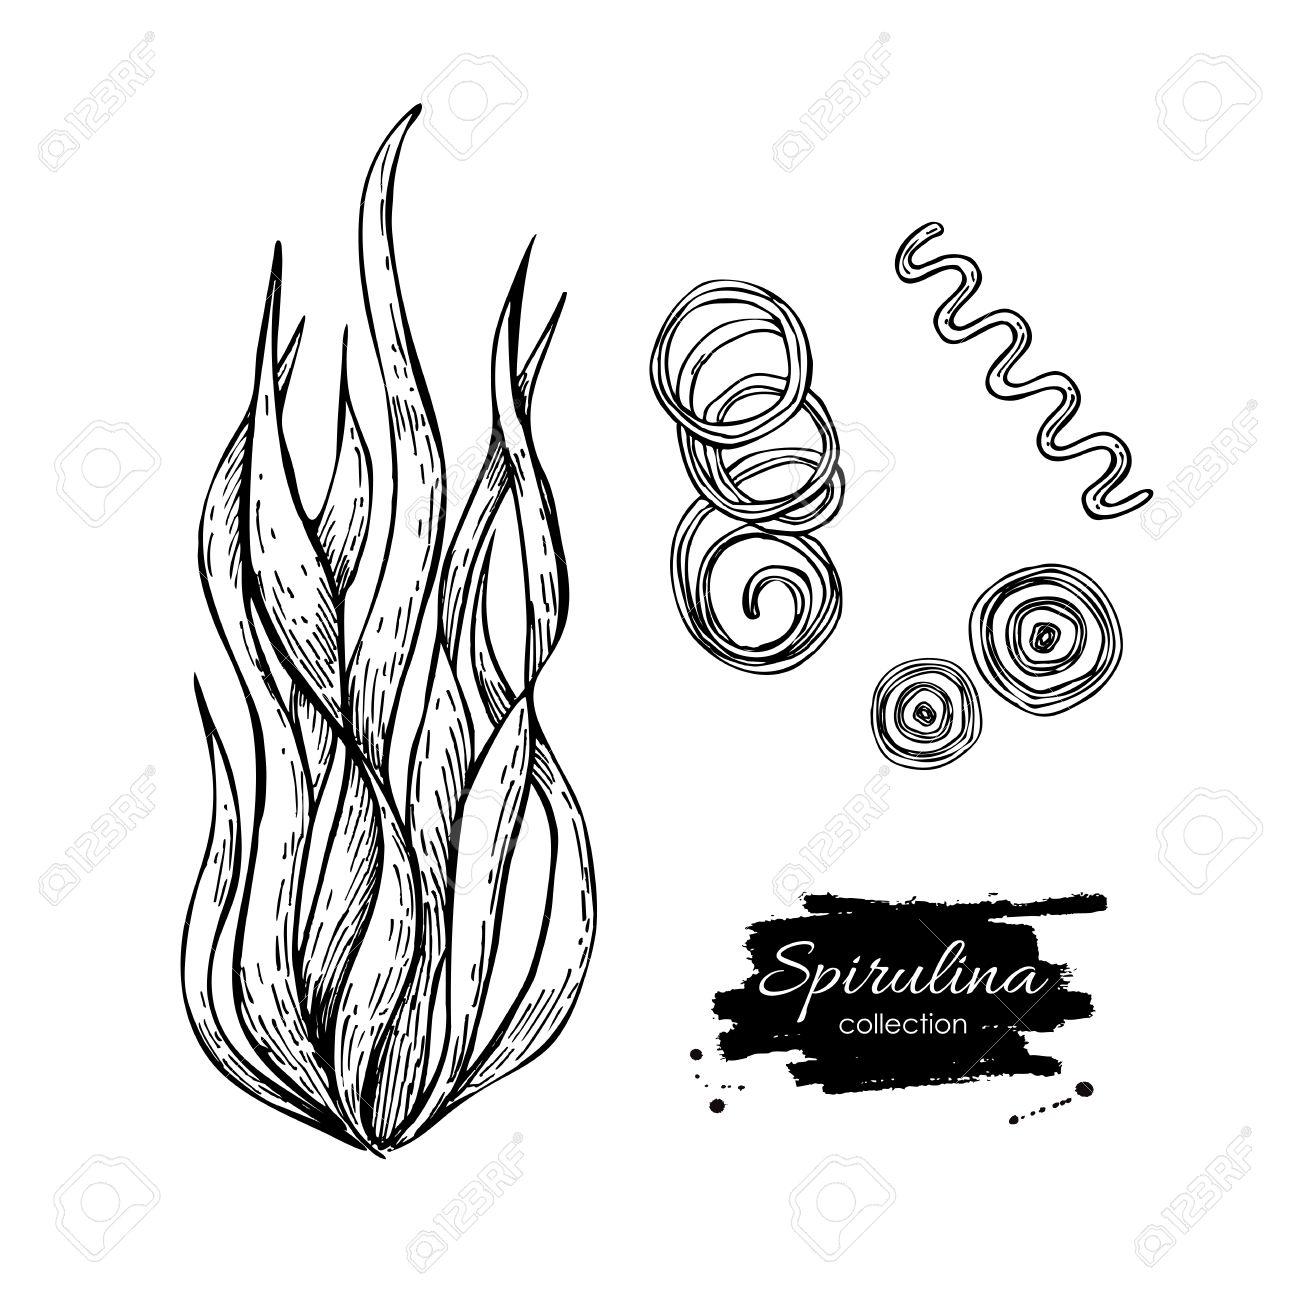 1300x1300 Spirulina Seaweed Hand Drawn Vector. Isolated Spirulina Algae